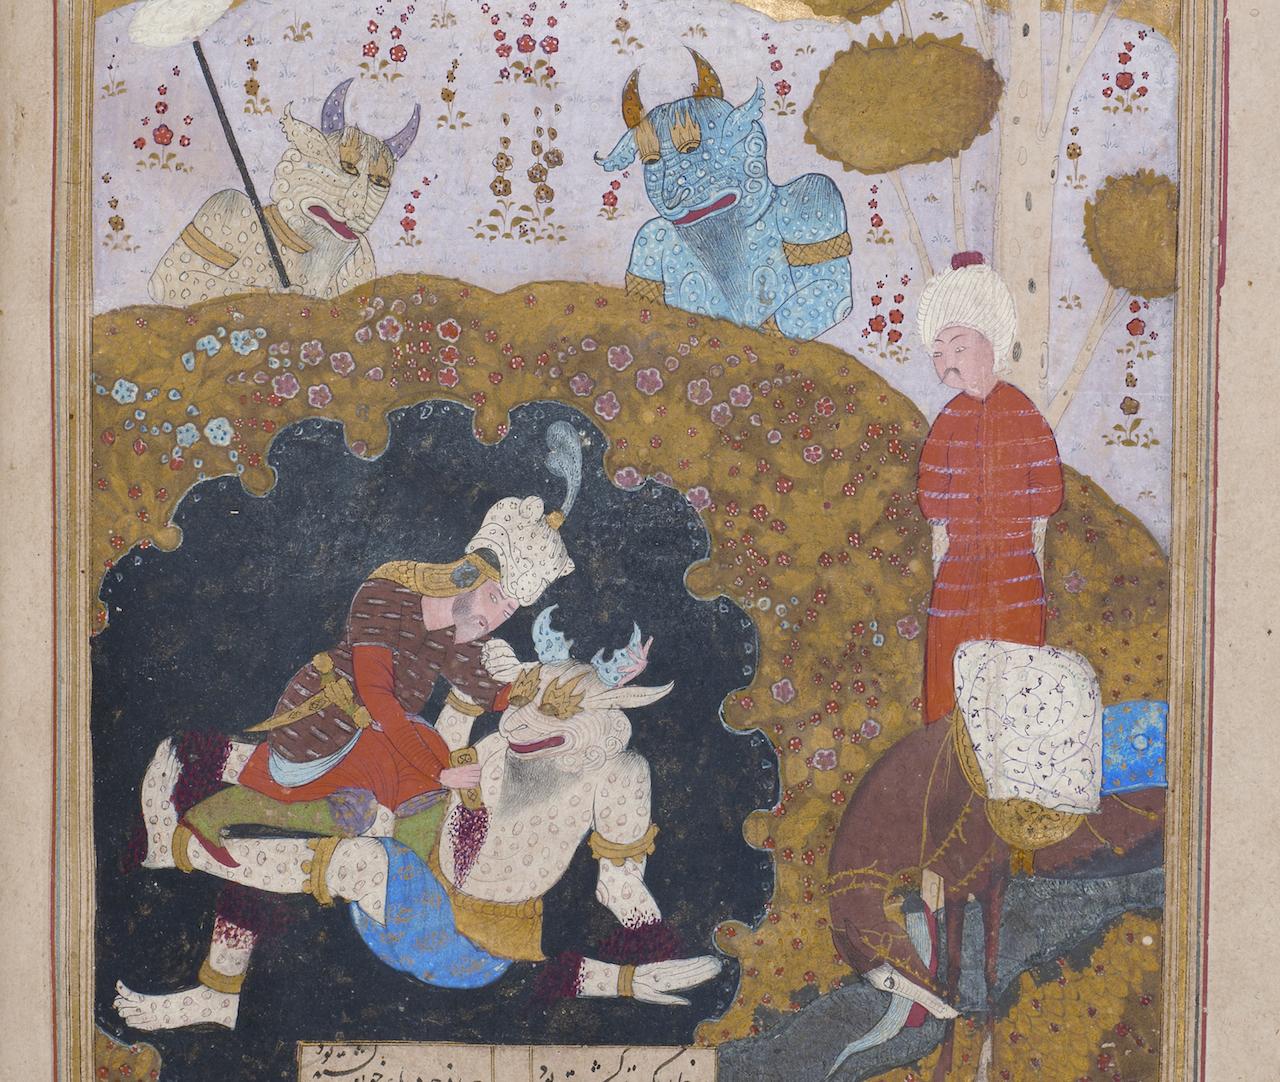 Rustam slays the White Div, in Abu'l Qasim Firdousi's 'Shahnama (Book of Kings)' (Shiraz, 1542) (courtesy the University of Manchester)